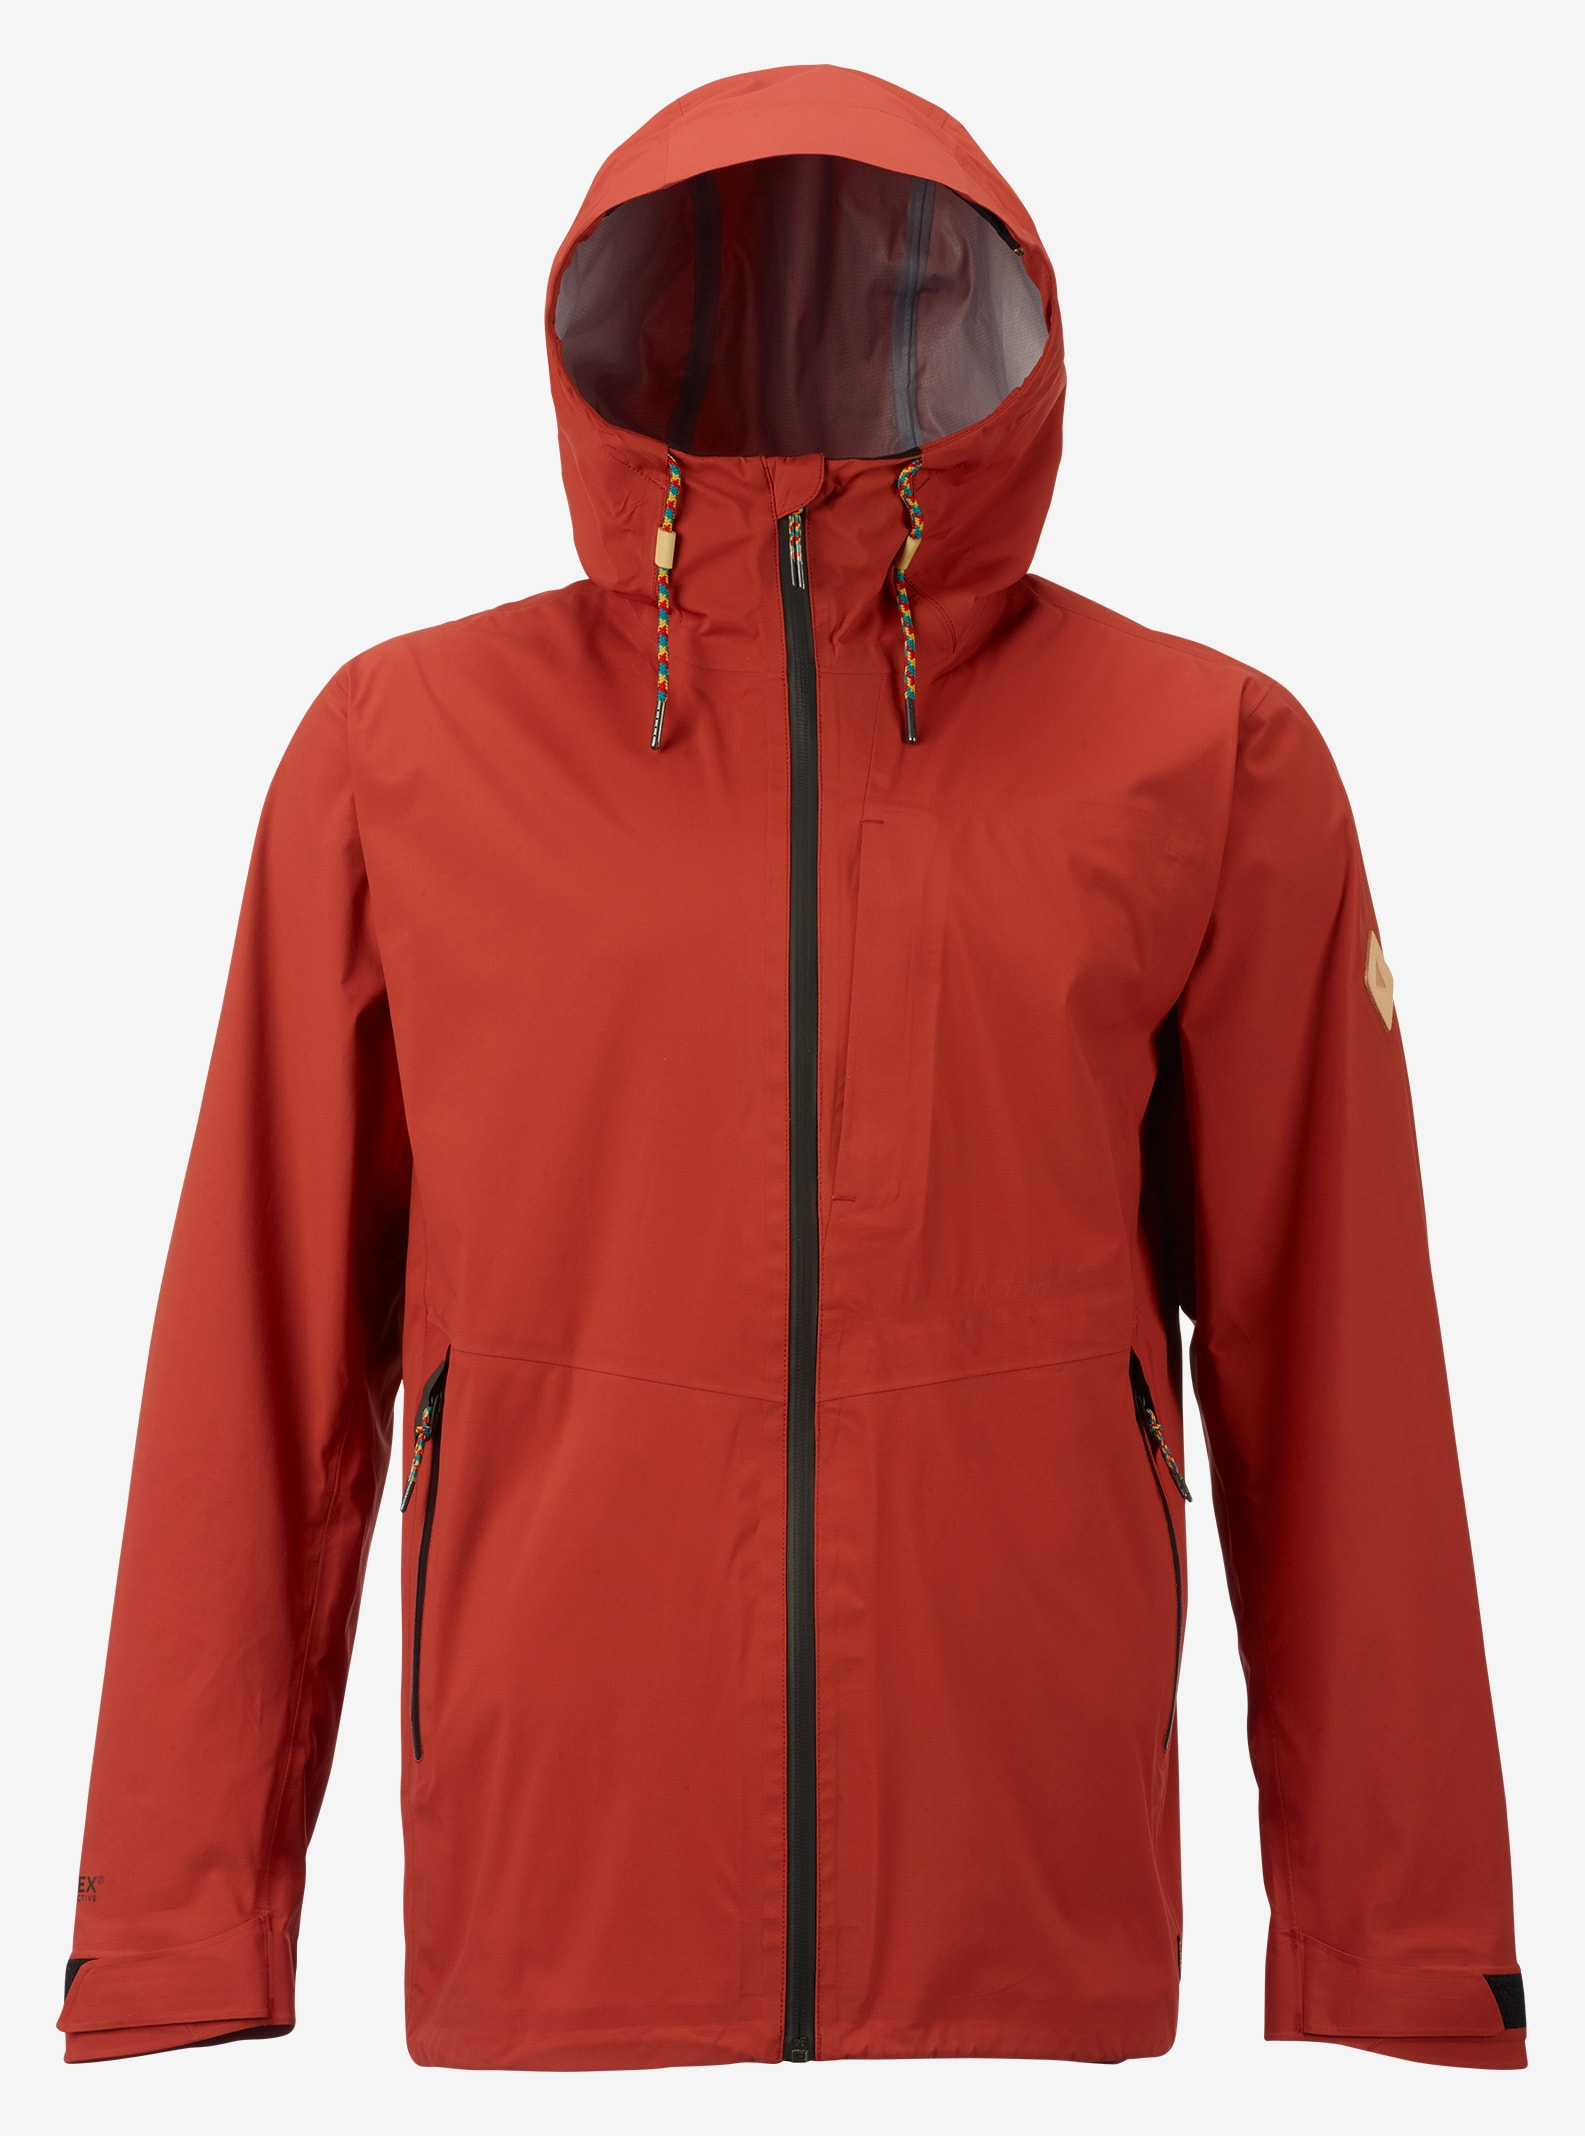 Burton GORE-TEX® 3L Sterling Rain Jacket shown in Tandori